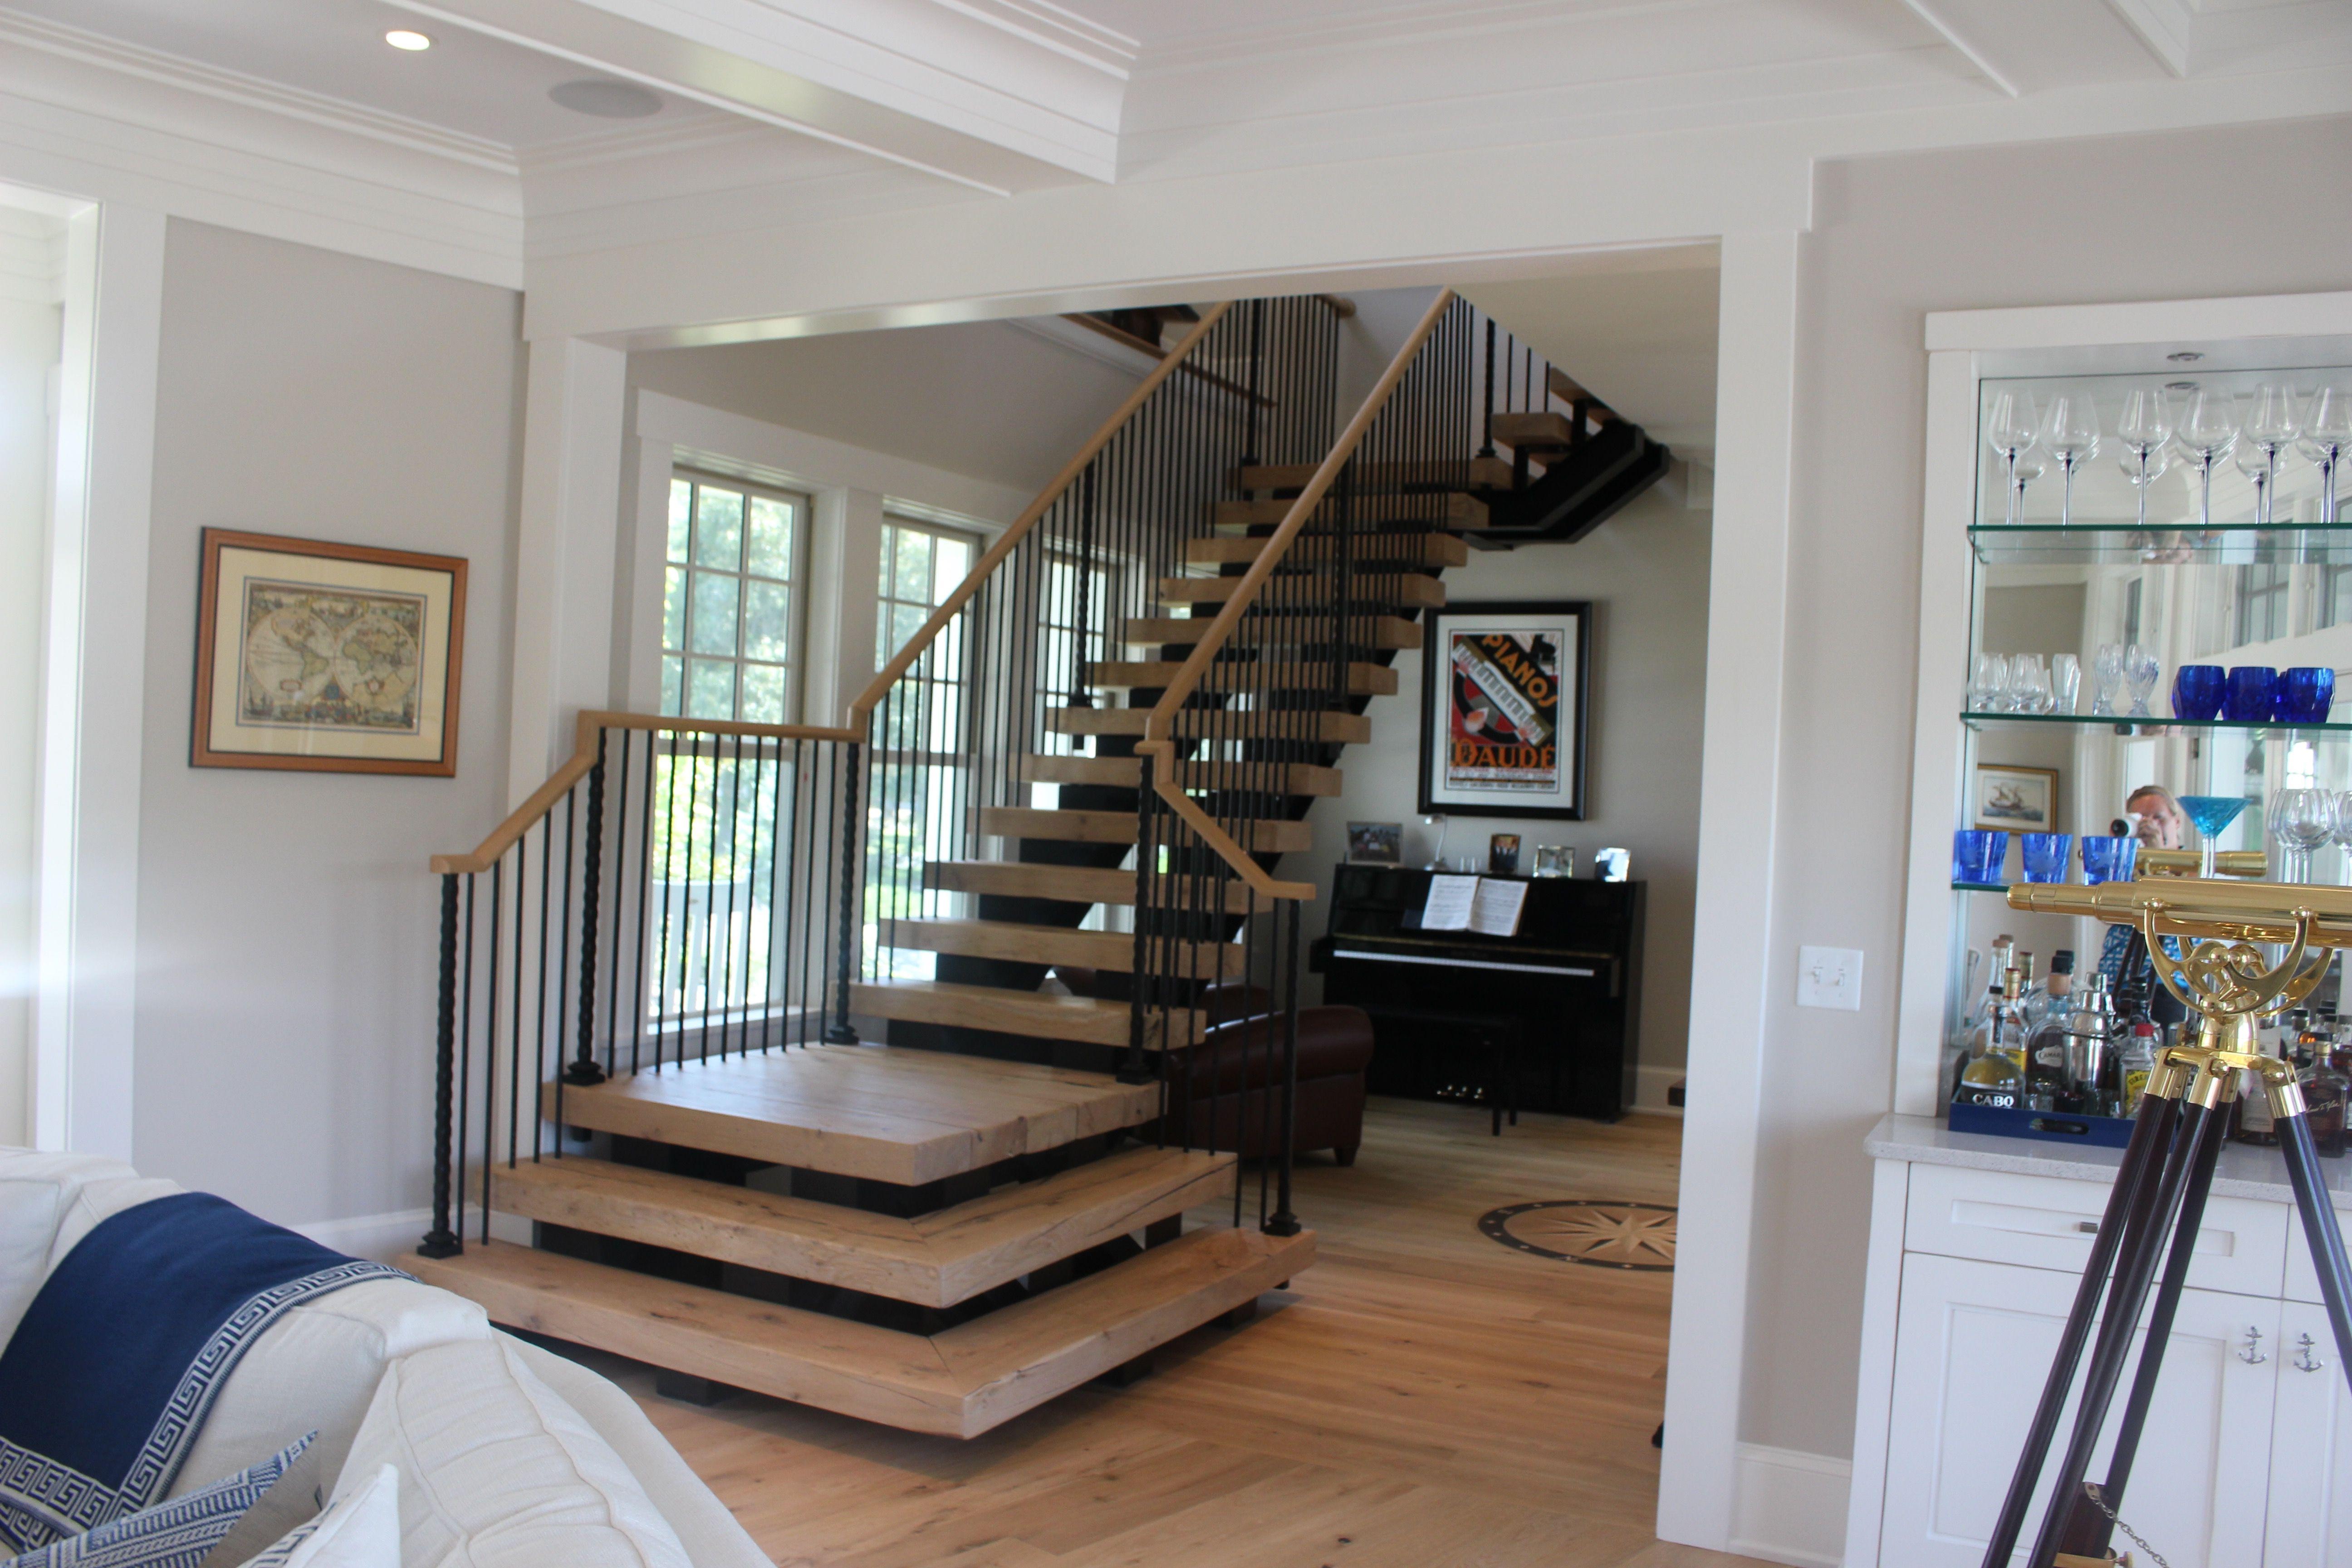 Live Sawn White Oak Stair Treads And Flooring Available At   American Oak Stair Treads   Stair Case   Stair Railing   Hardwood Floors   Beech American   Walnut